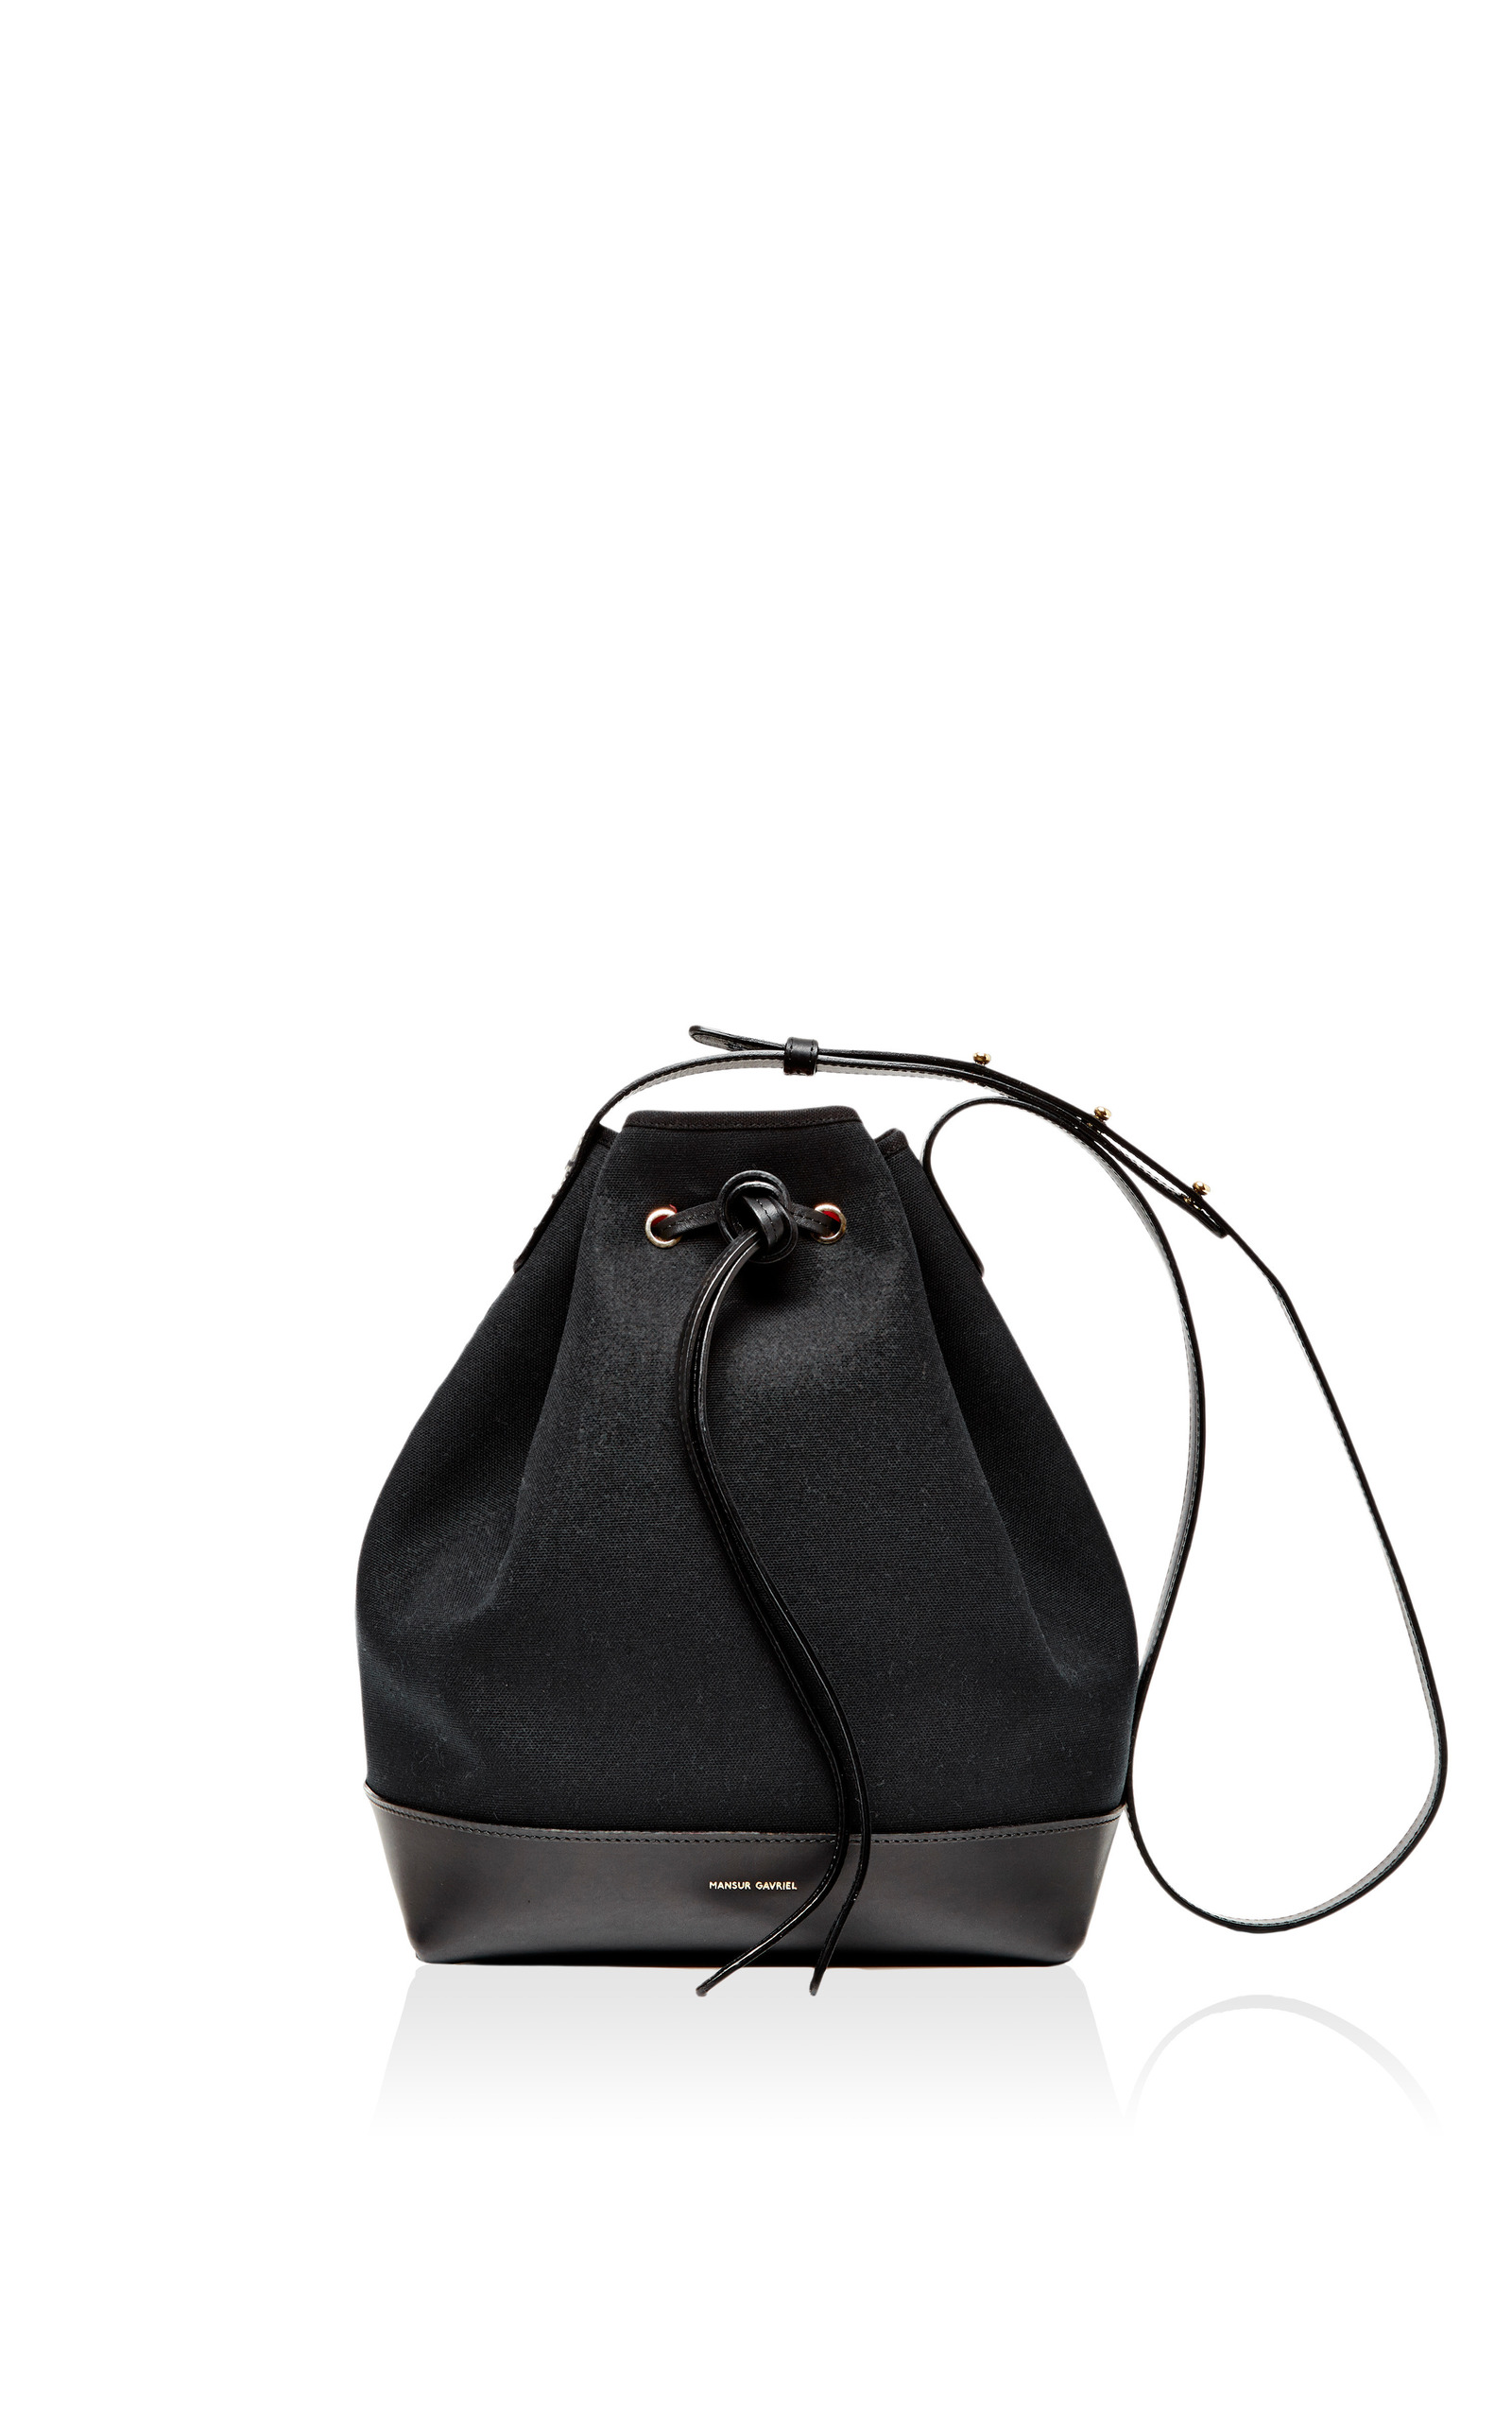 e7fe2563edcf Mansur GavrielBlack Canvas and Leather Bucket Bag. CLOSE. Loading